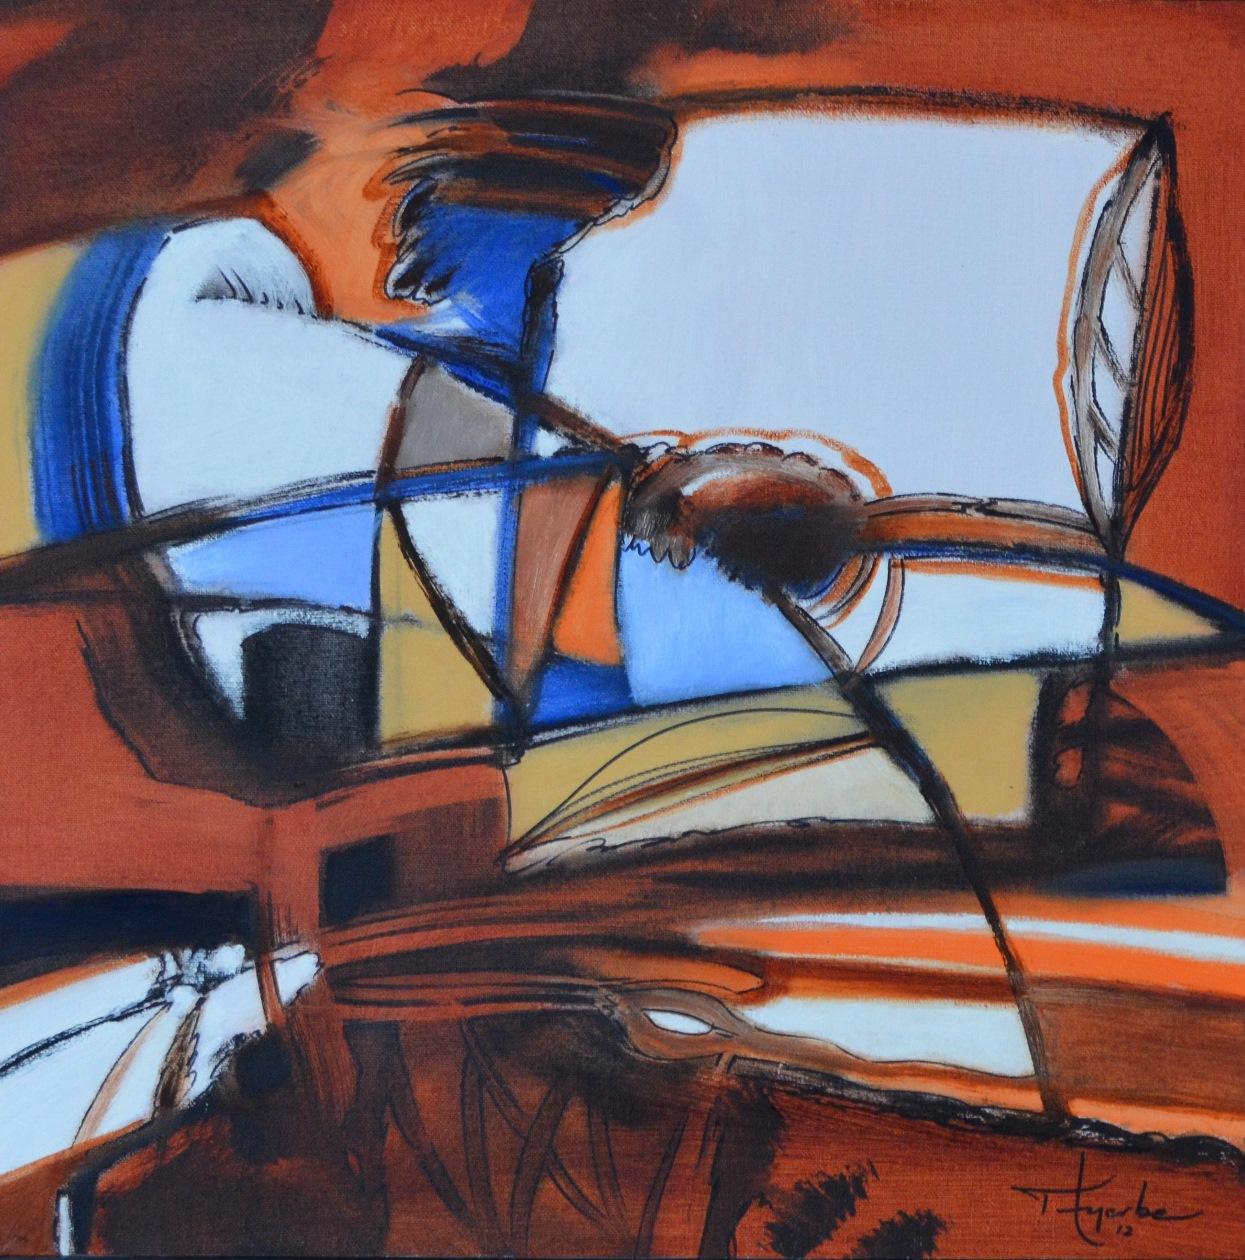 Cuadros modernos cuadros abstractos al leo for Cuadros al oleo modernos